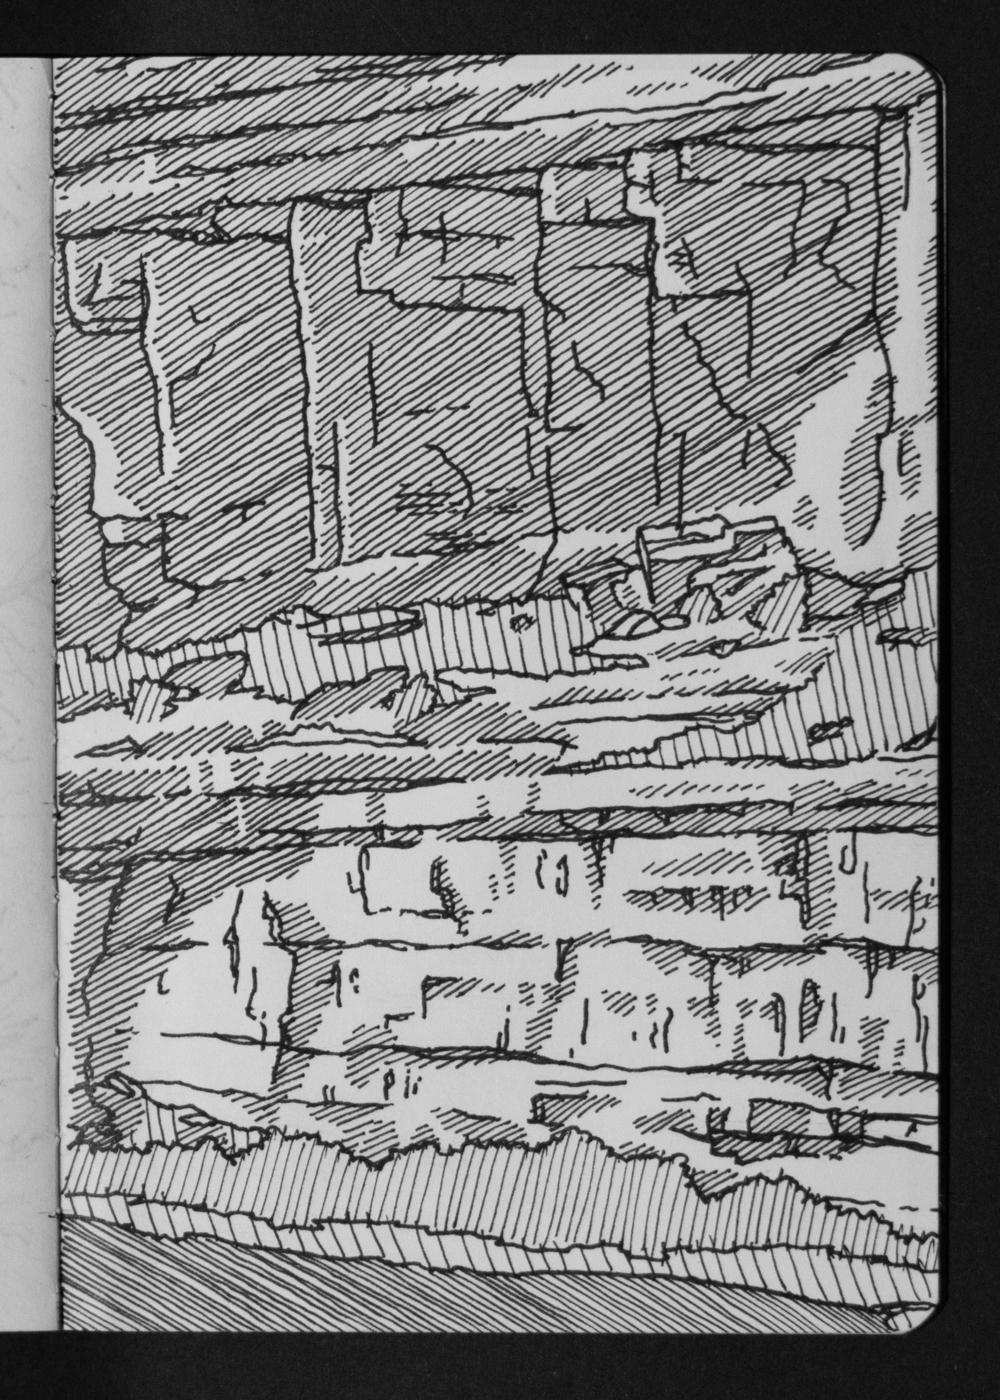 04-14 San Juan Cliff Wall Detail.jpg